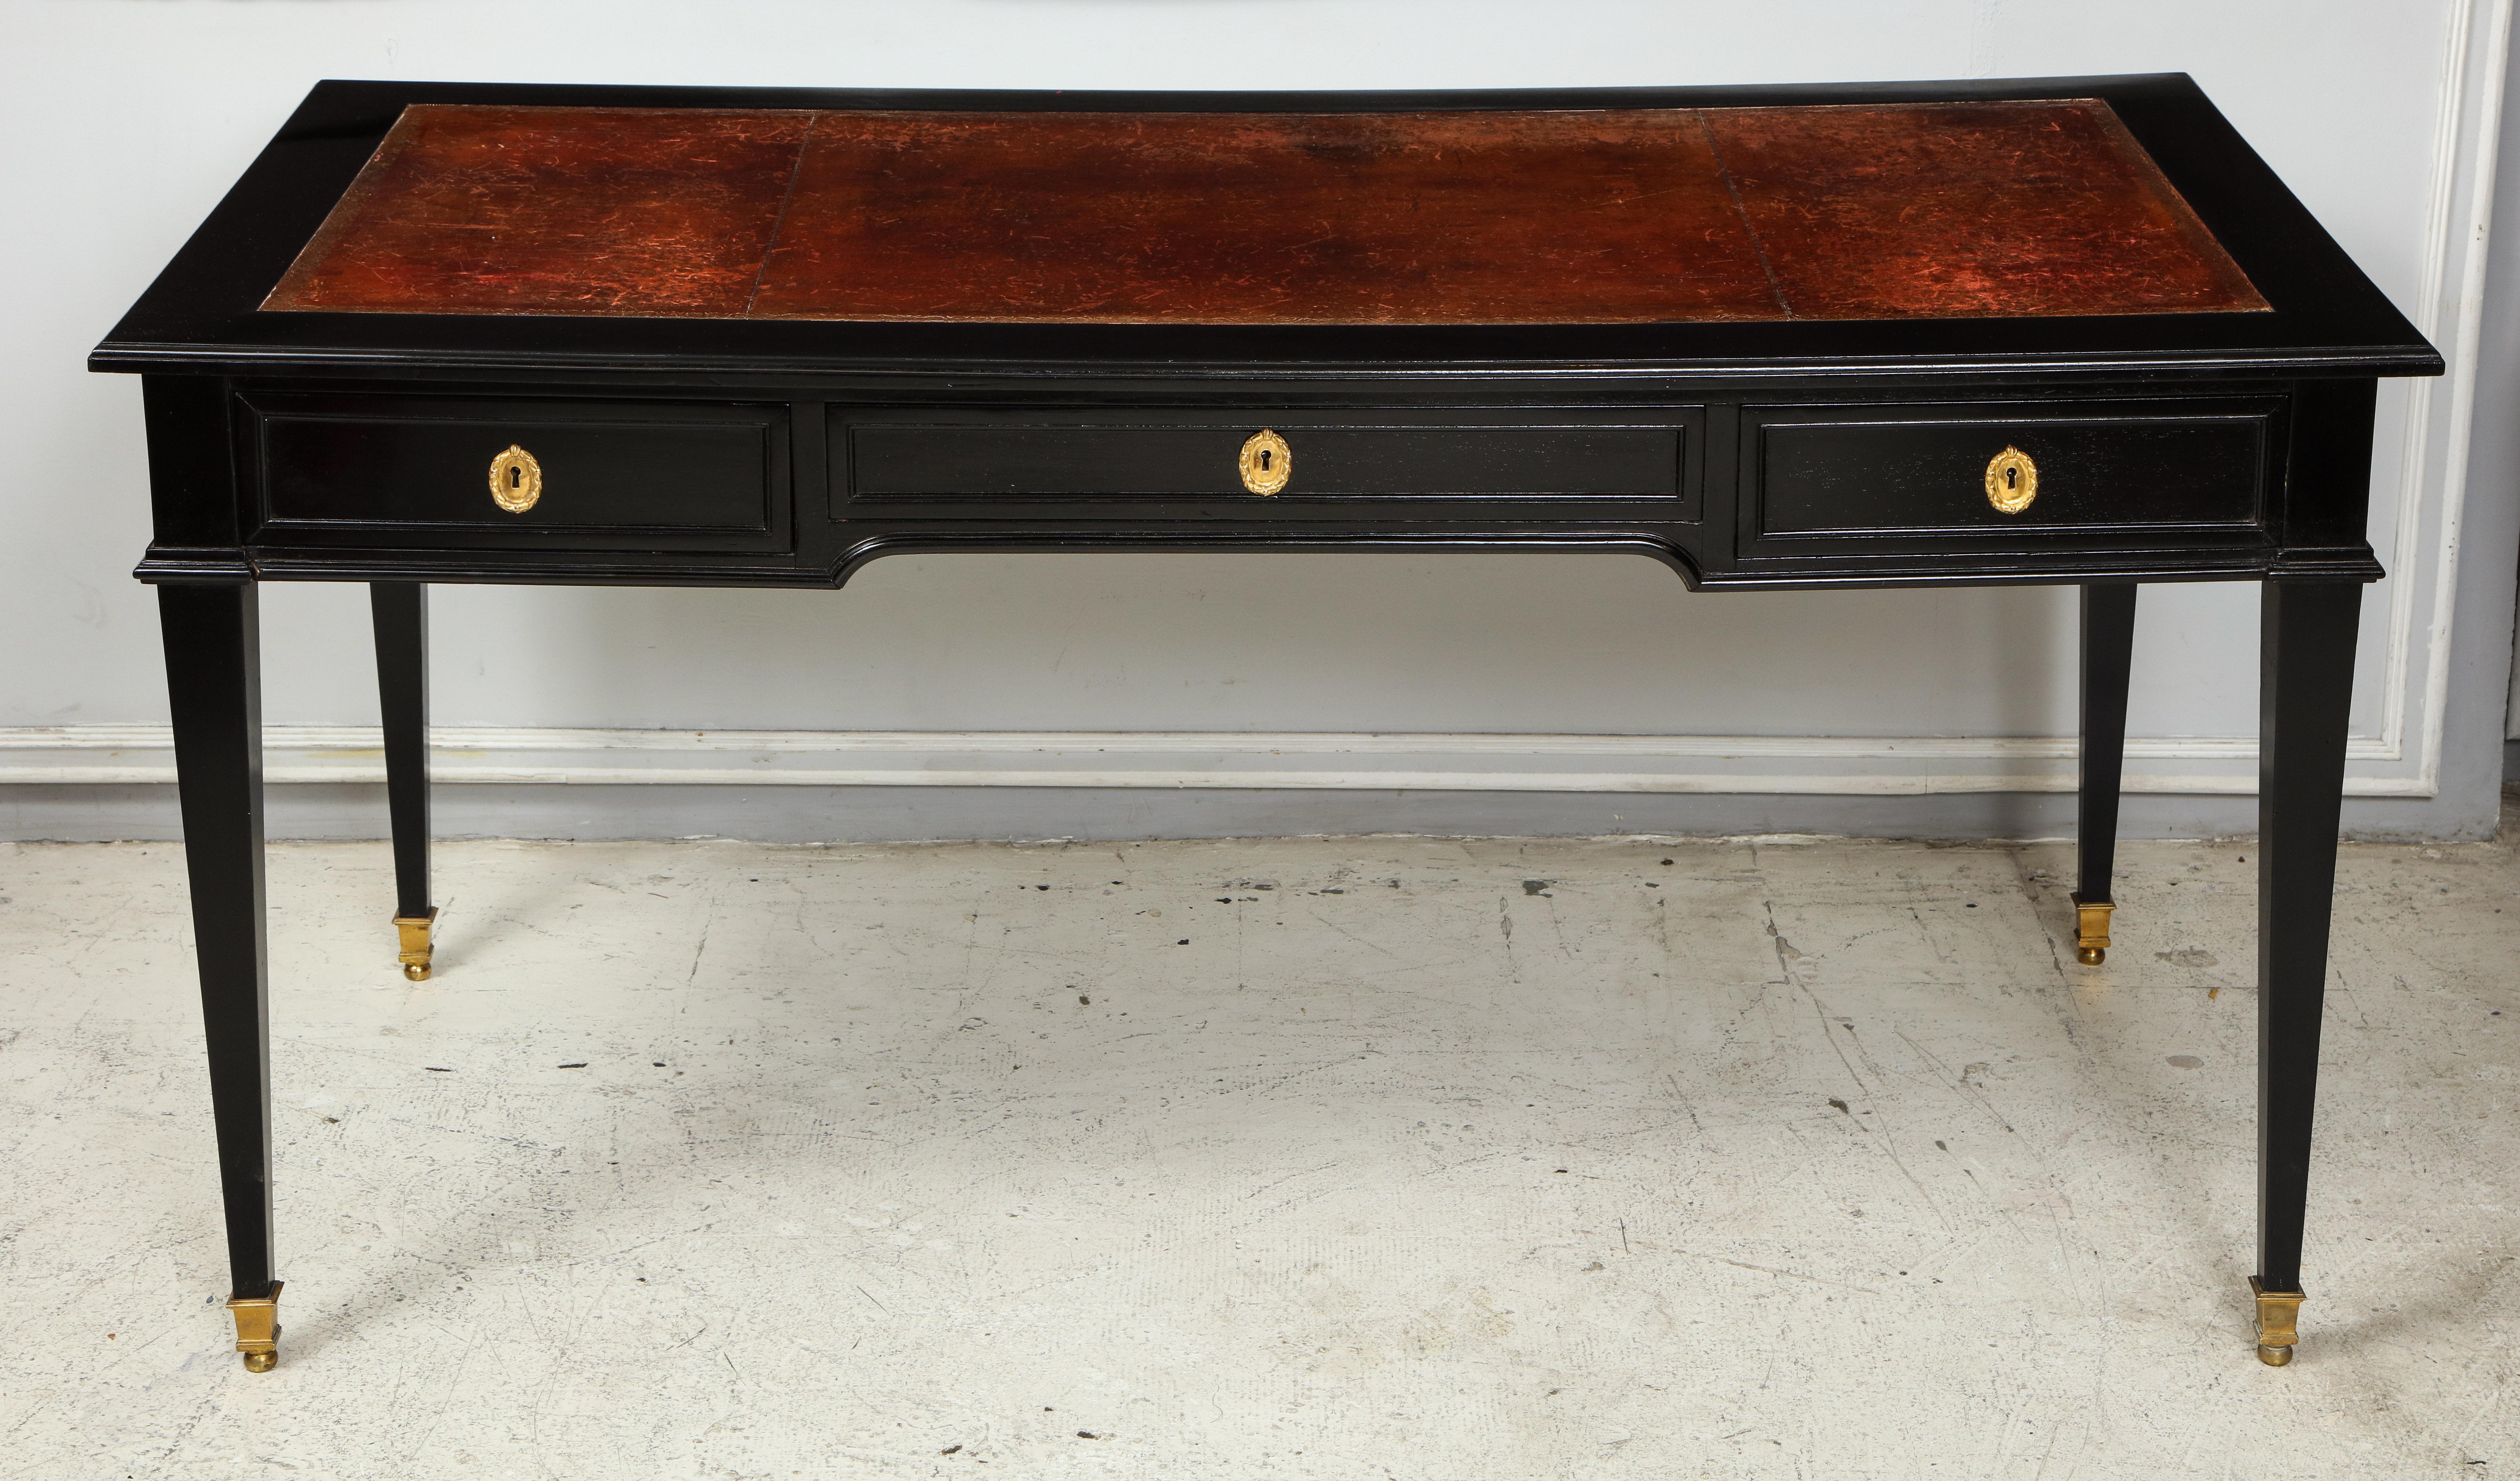 Signed maison jansen ebonized leather top bureau plat desk on